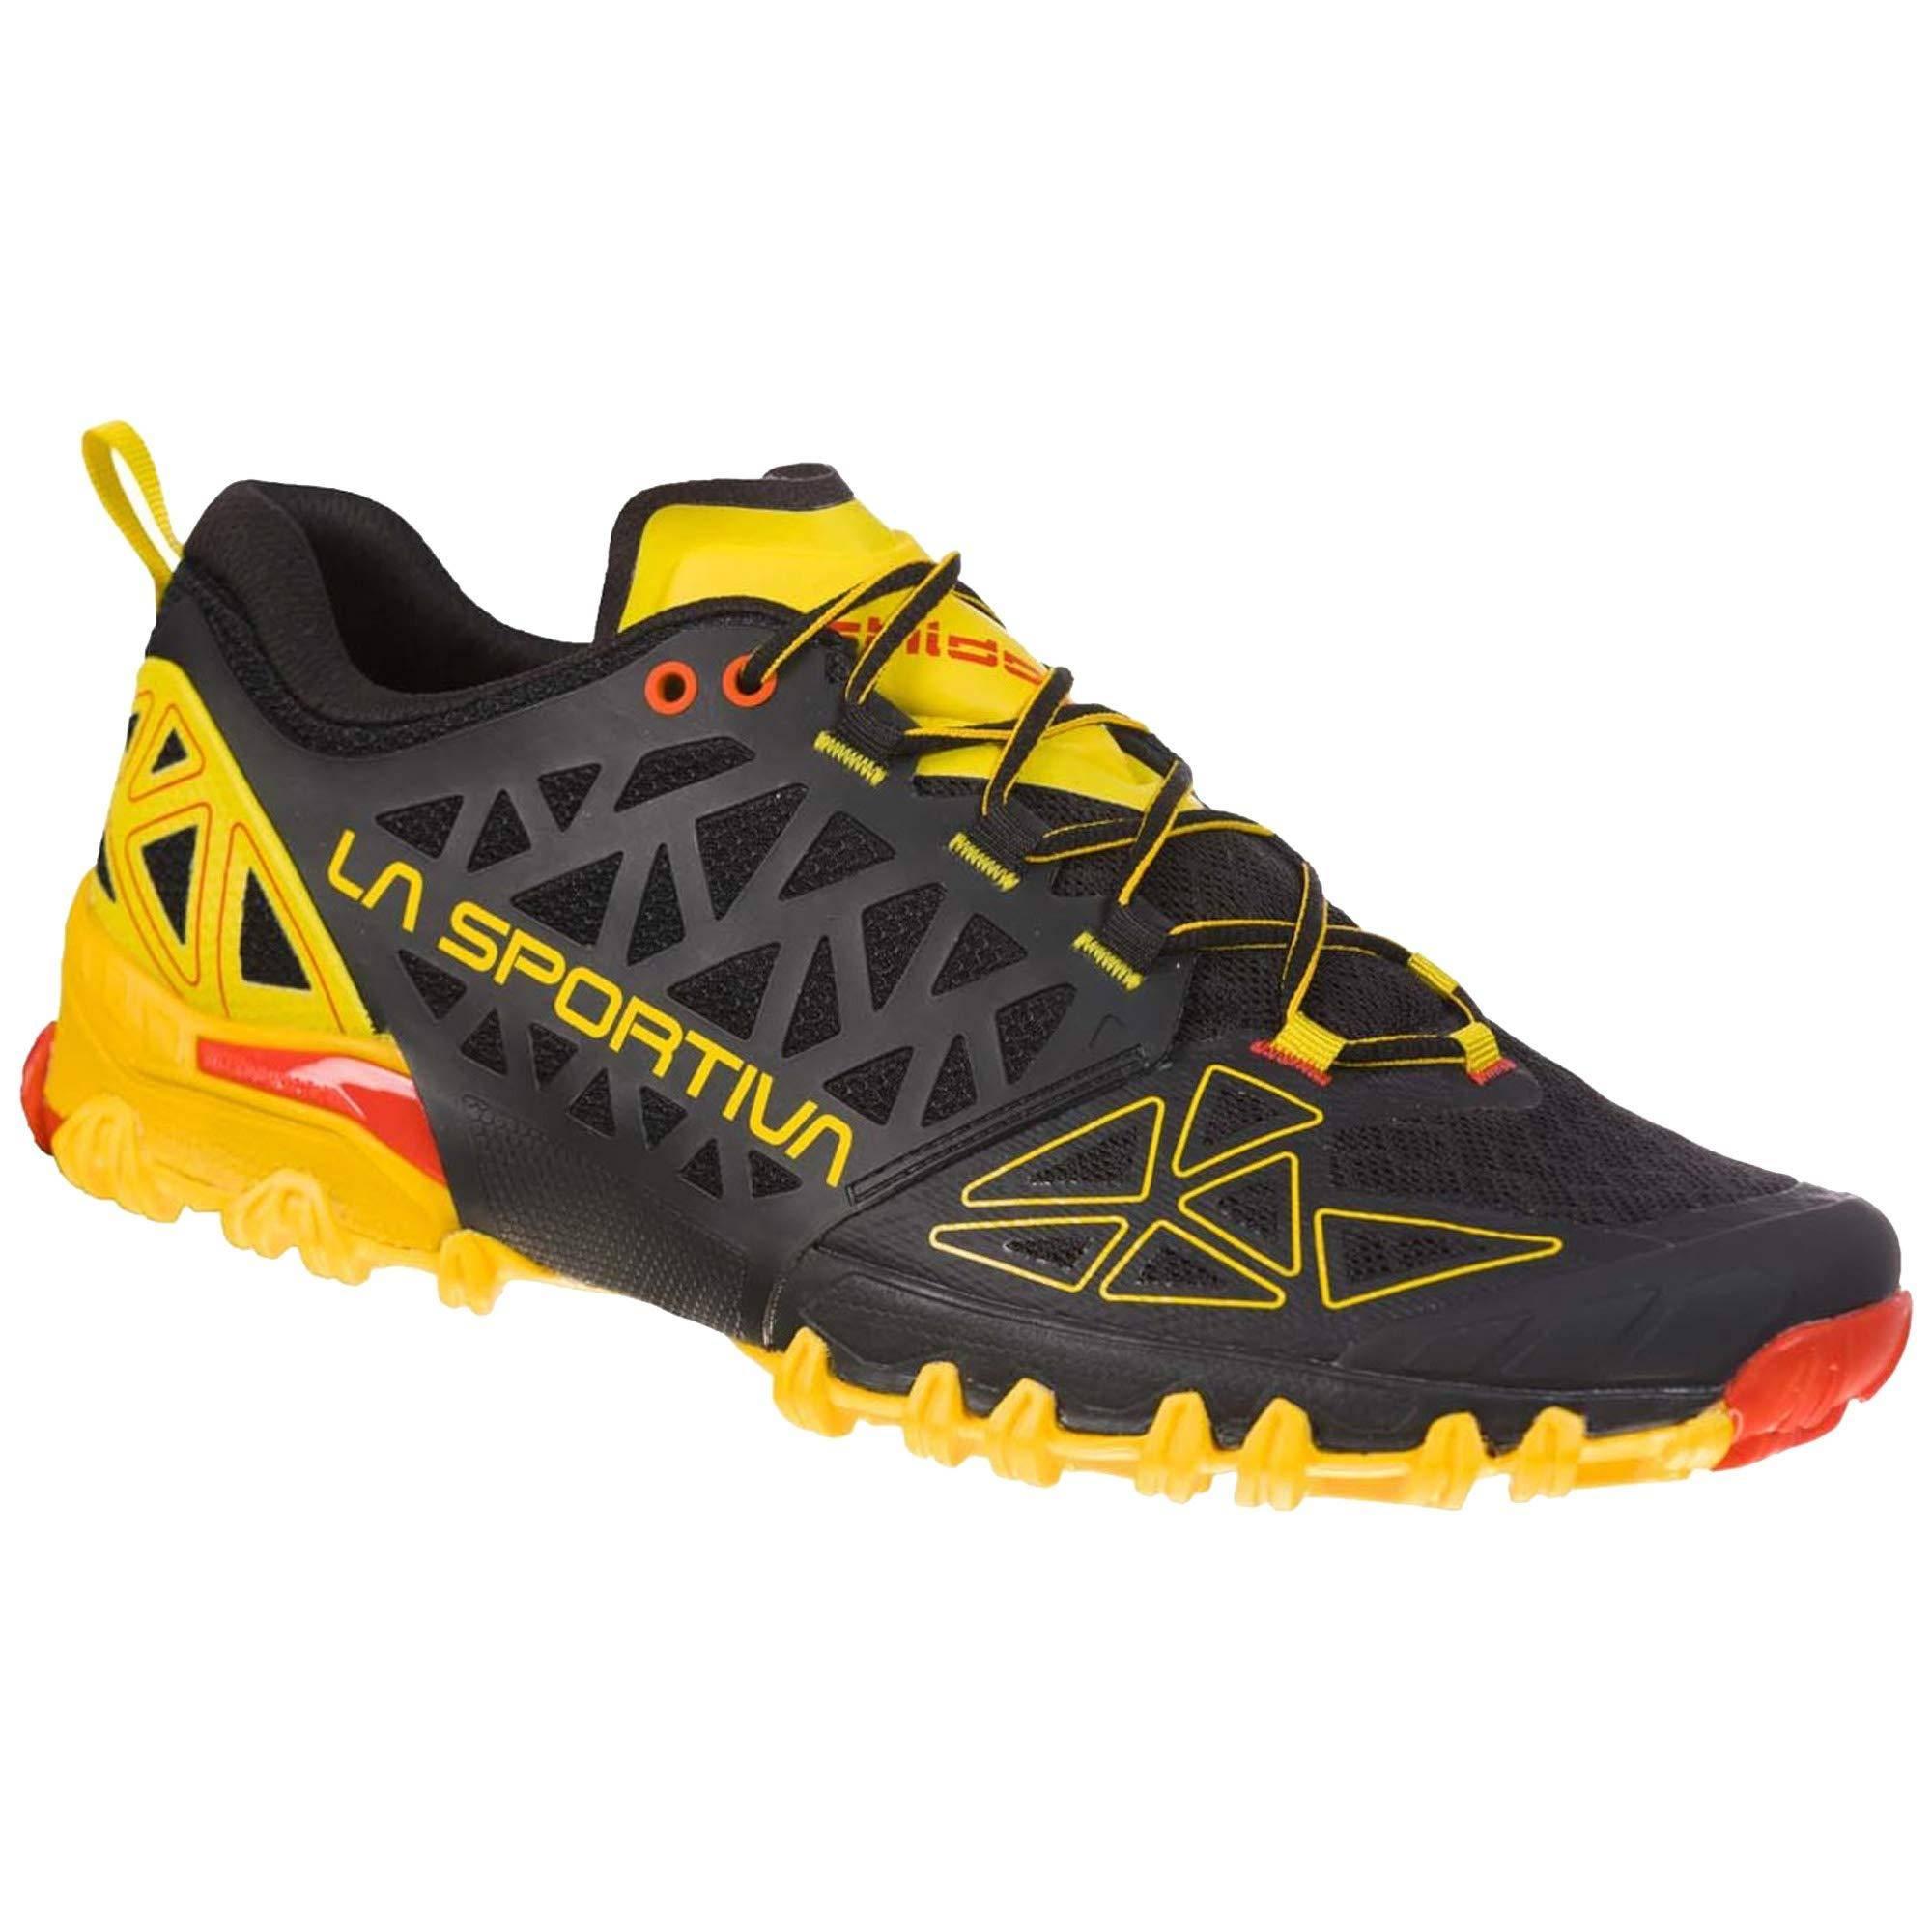 La Sportiva Bushido II Running Shoe, Carbon/Tangerine | Konnichi wa